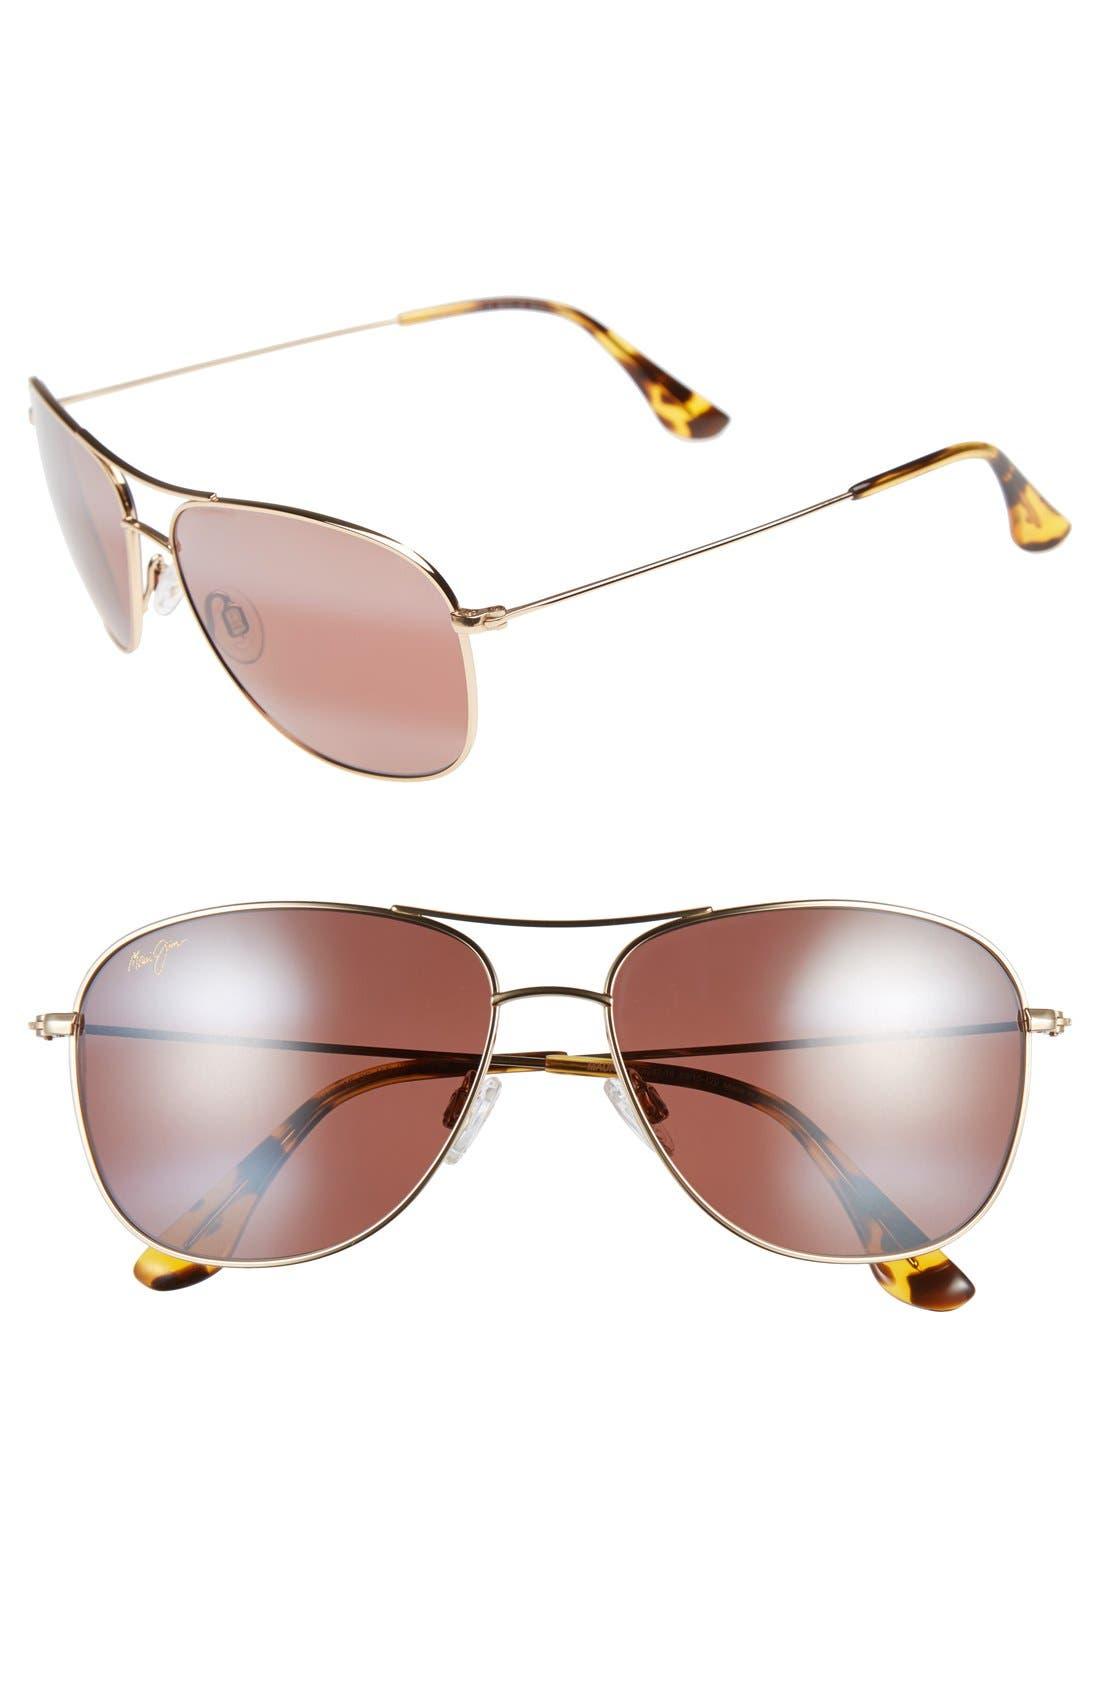 Cliff House 59mm PolarizedPlus2<sup>®</sup> Metal Aviator Sunglasses,                         Main,                         color, Gold/ Maui Rose